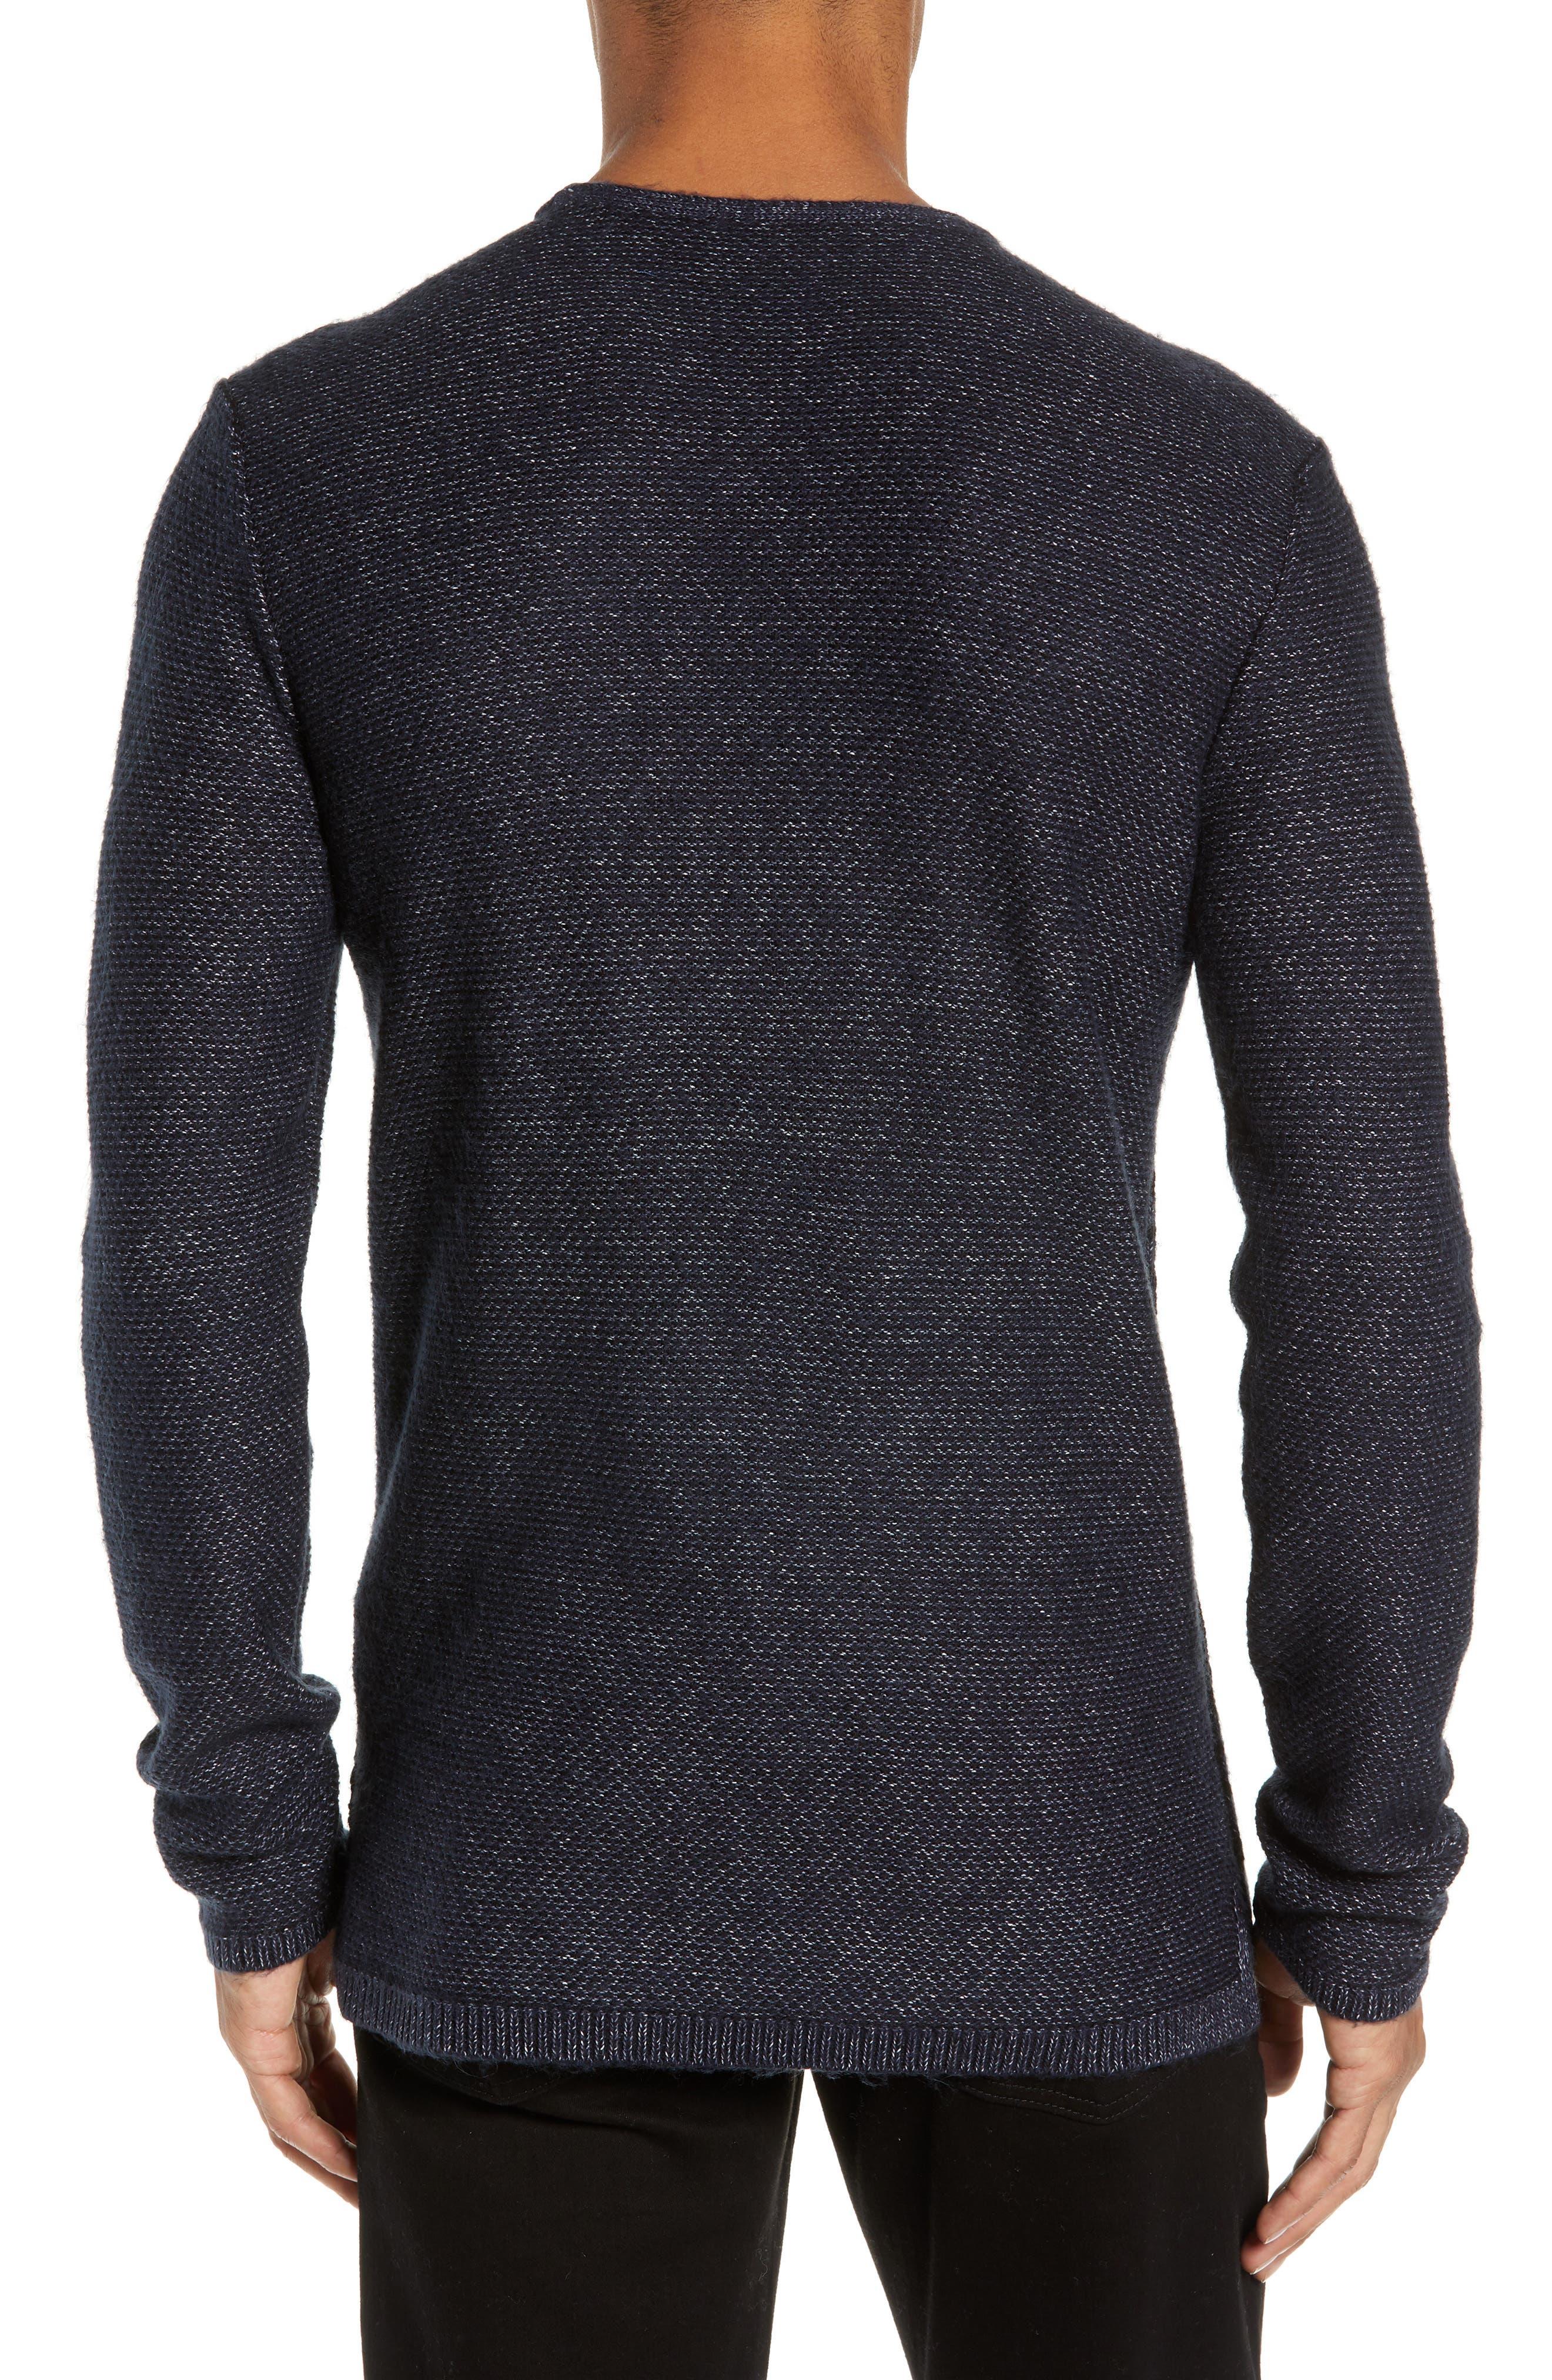 Mix Stitch Regular Fit Cotton Blend Sweater,                             Alternate thumbnail 2, color,                             INK BLUE